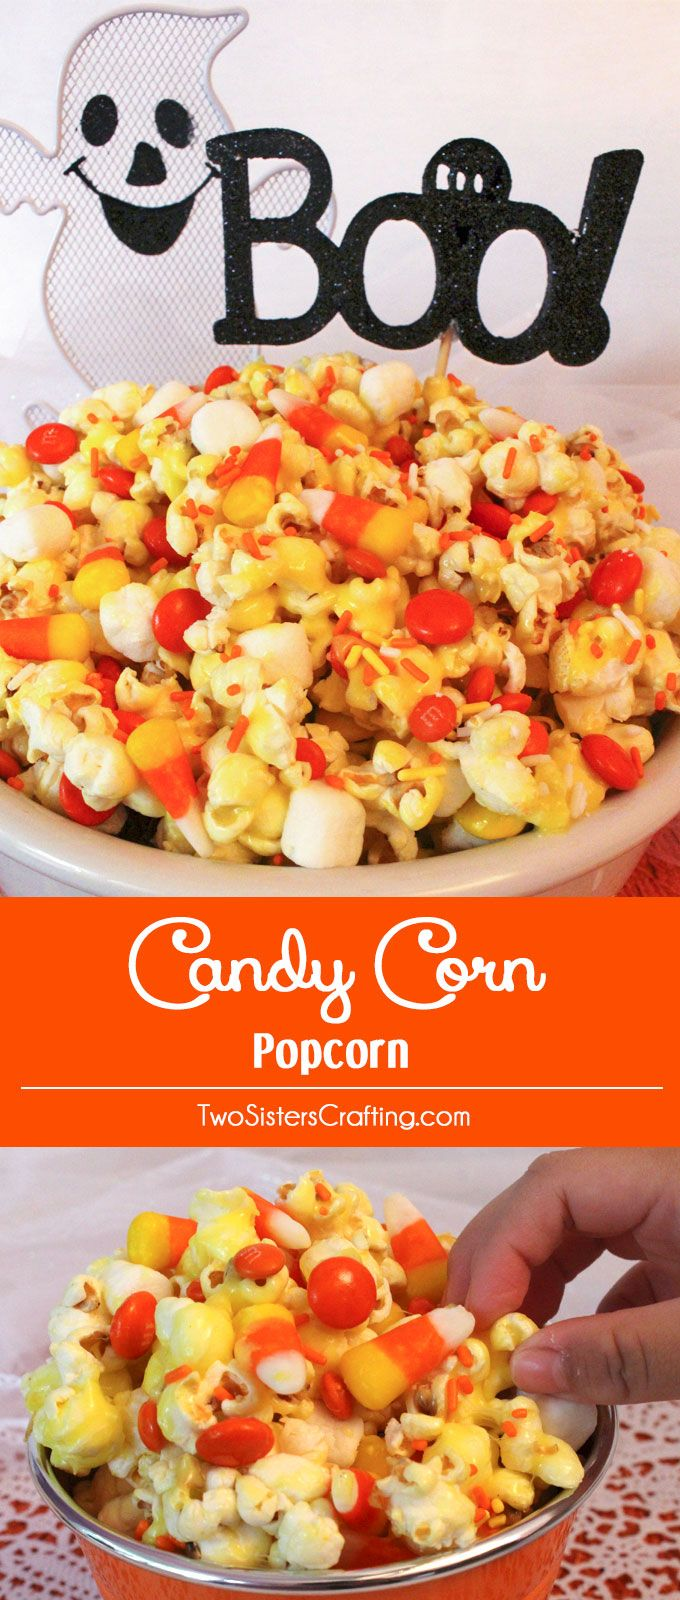 halloween dessert ideas parties best 25 halloween sweet 16 ideas on pinterest hallowen party - Halloween Desserts For Parties